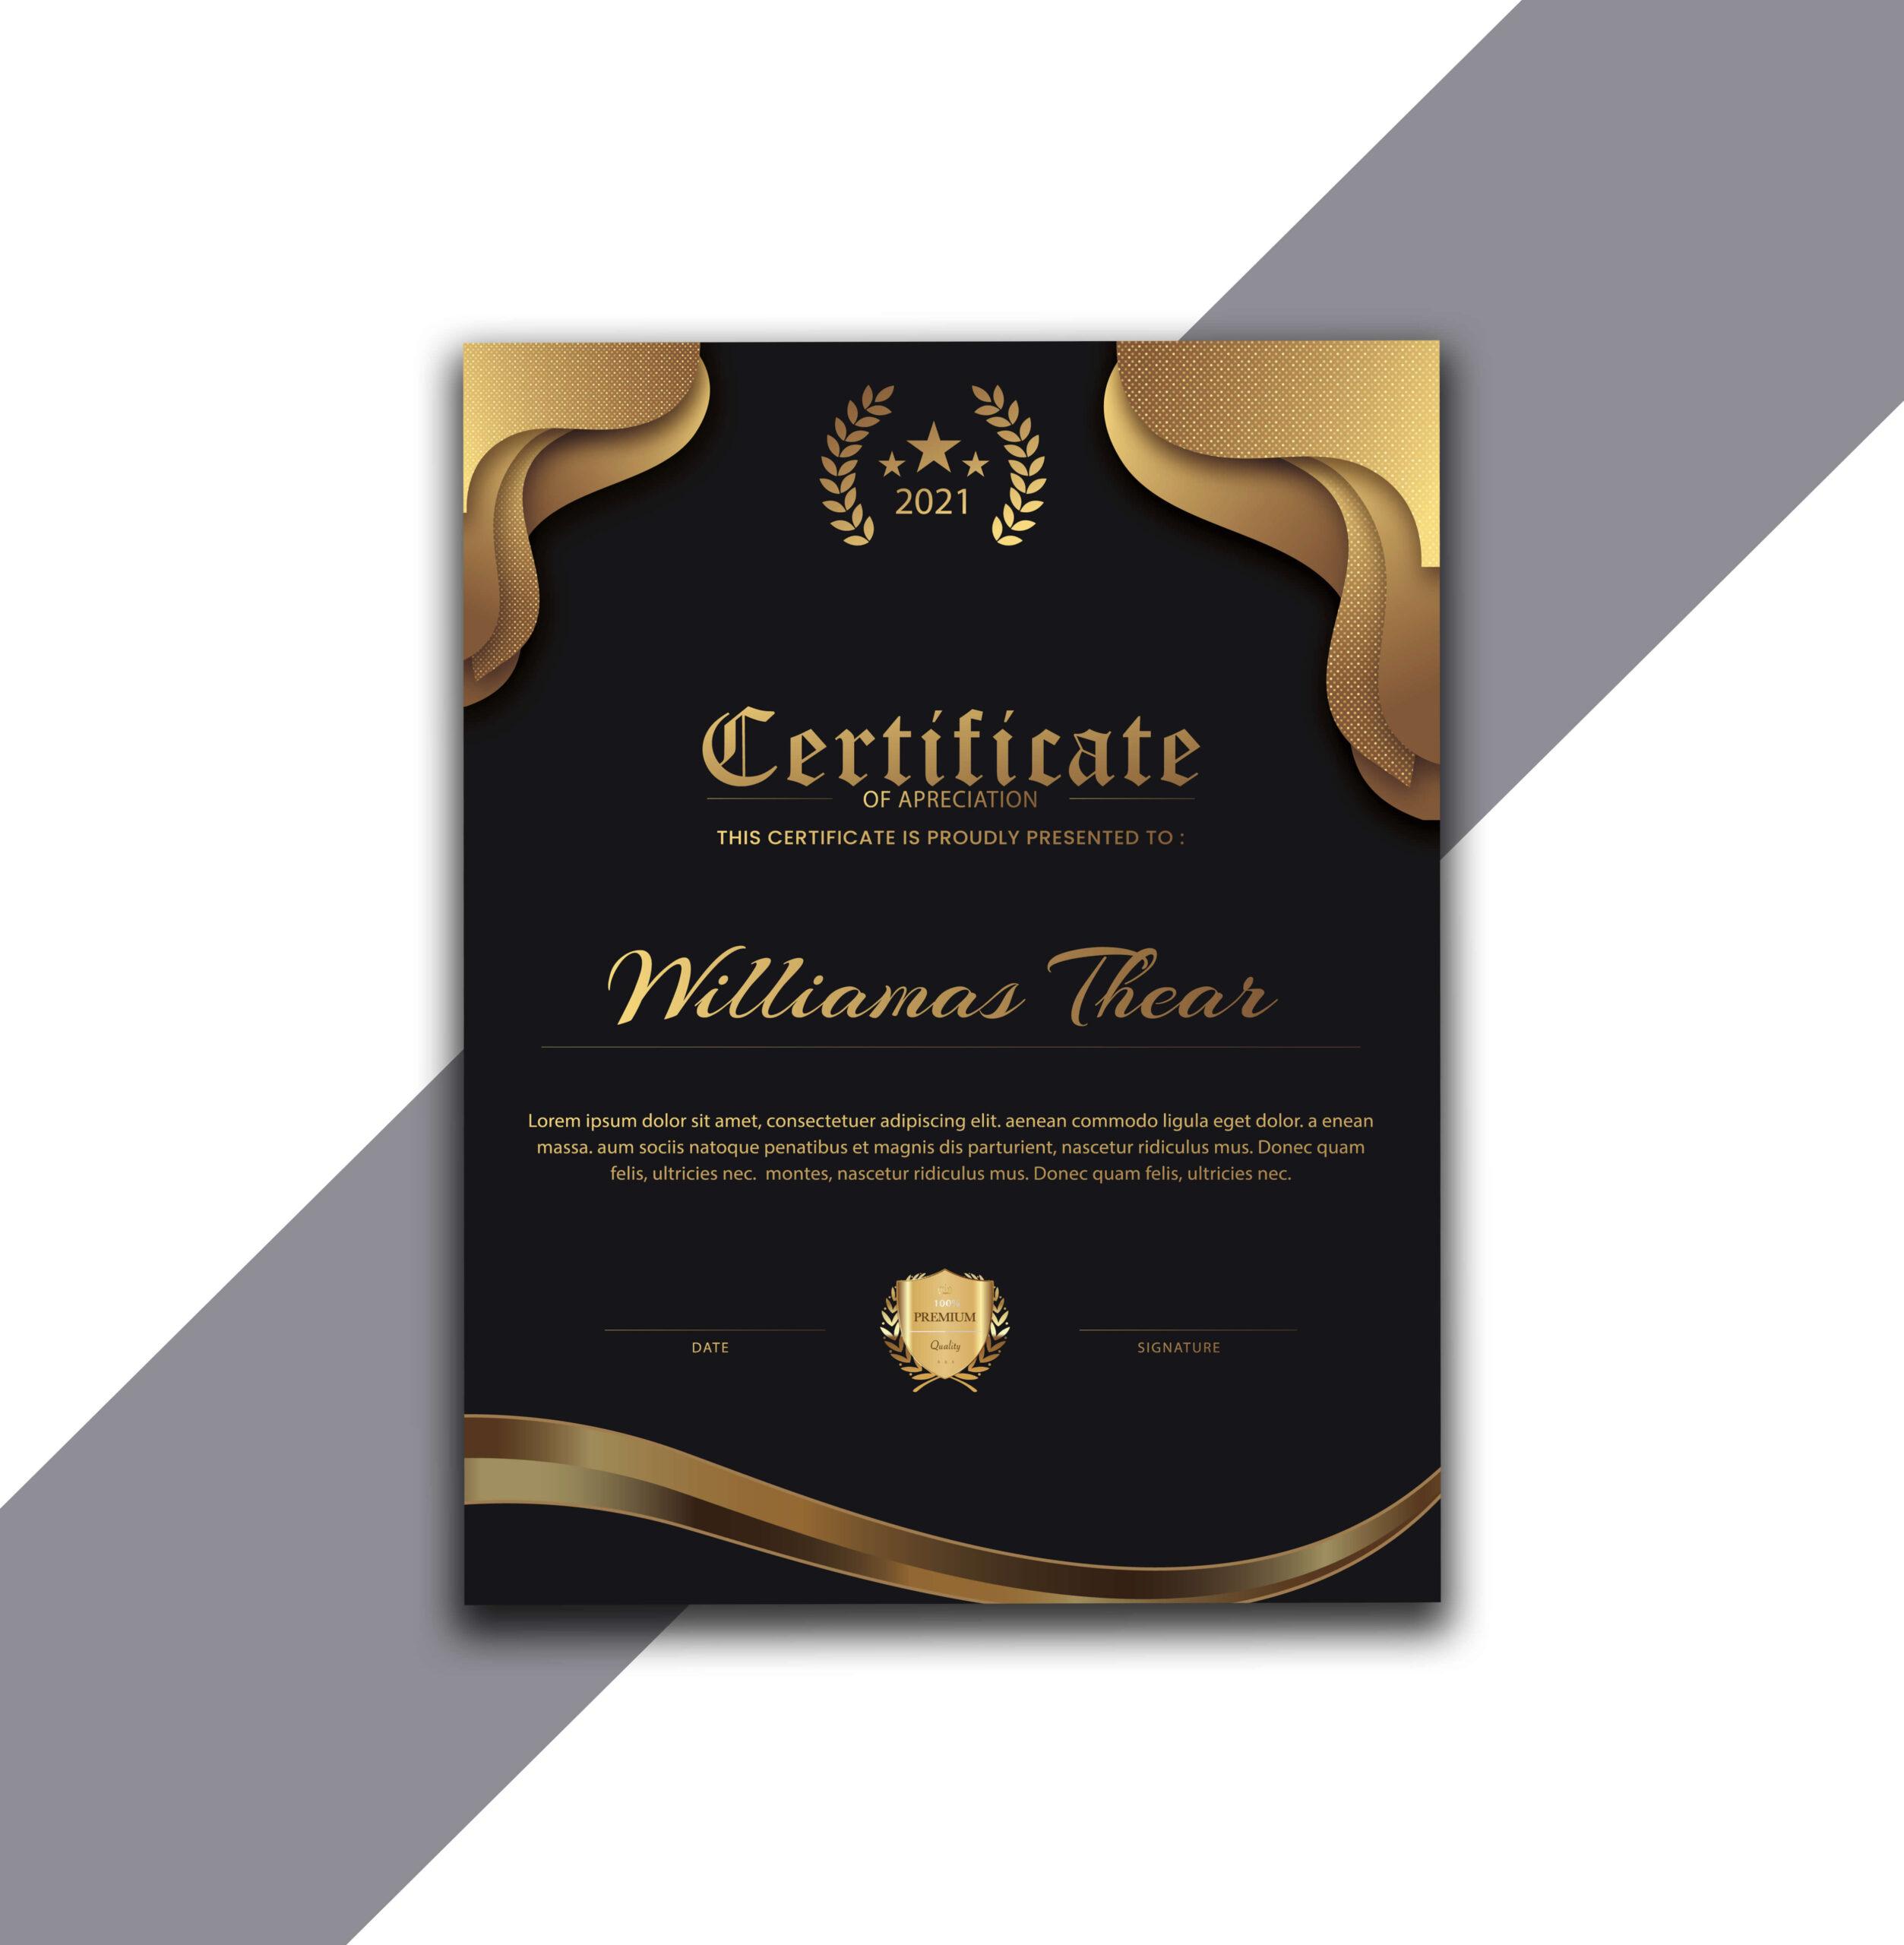 Black and Gold Vertical Certificate Design in Adobe Illustrator